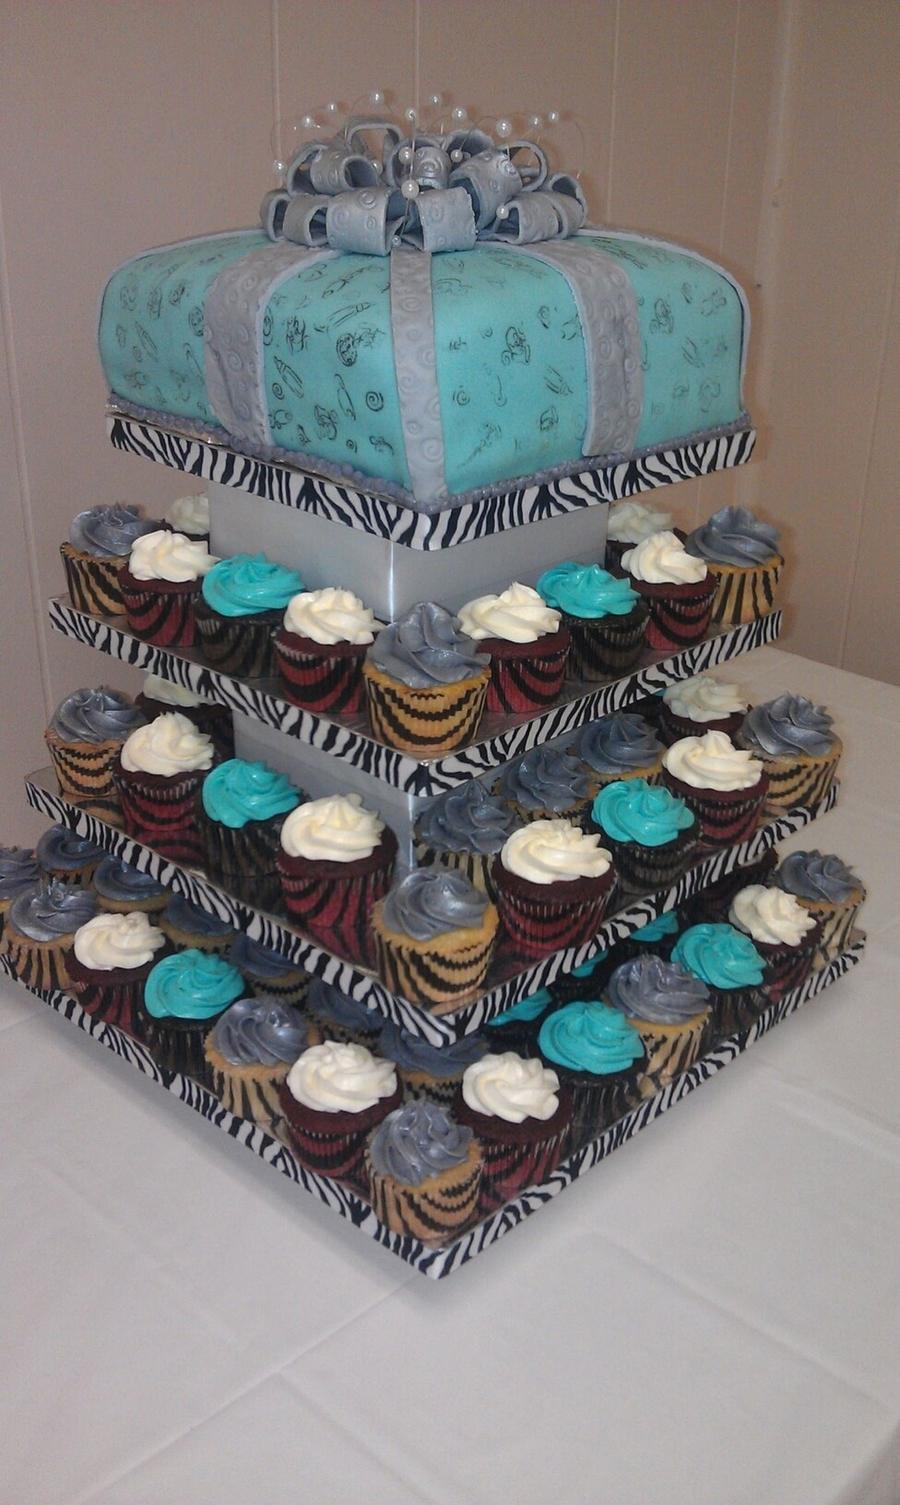 Tiffany Bluewhitesilverzebra Print Baby Shower Cakecentral